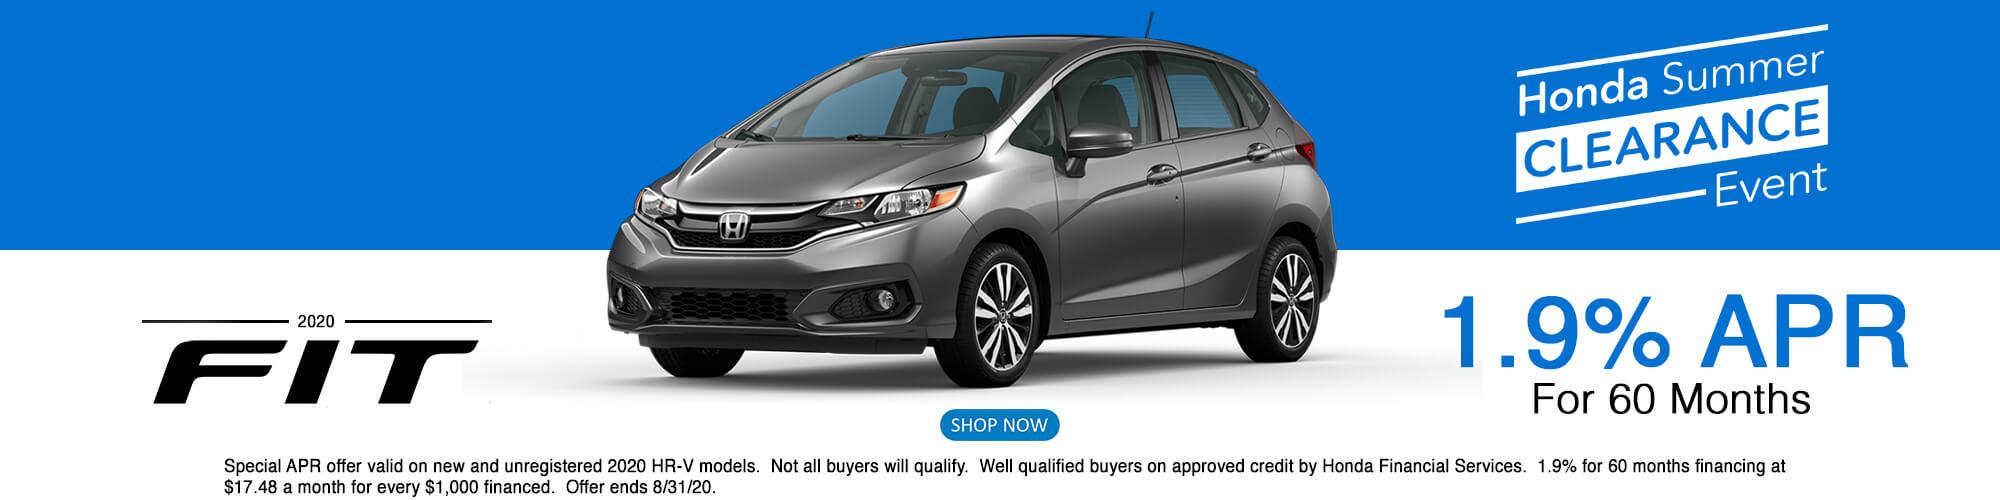 2020 Honda Fit APR Offer